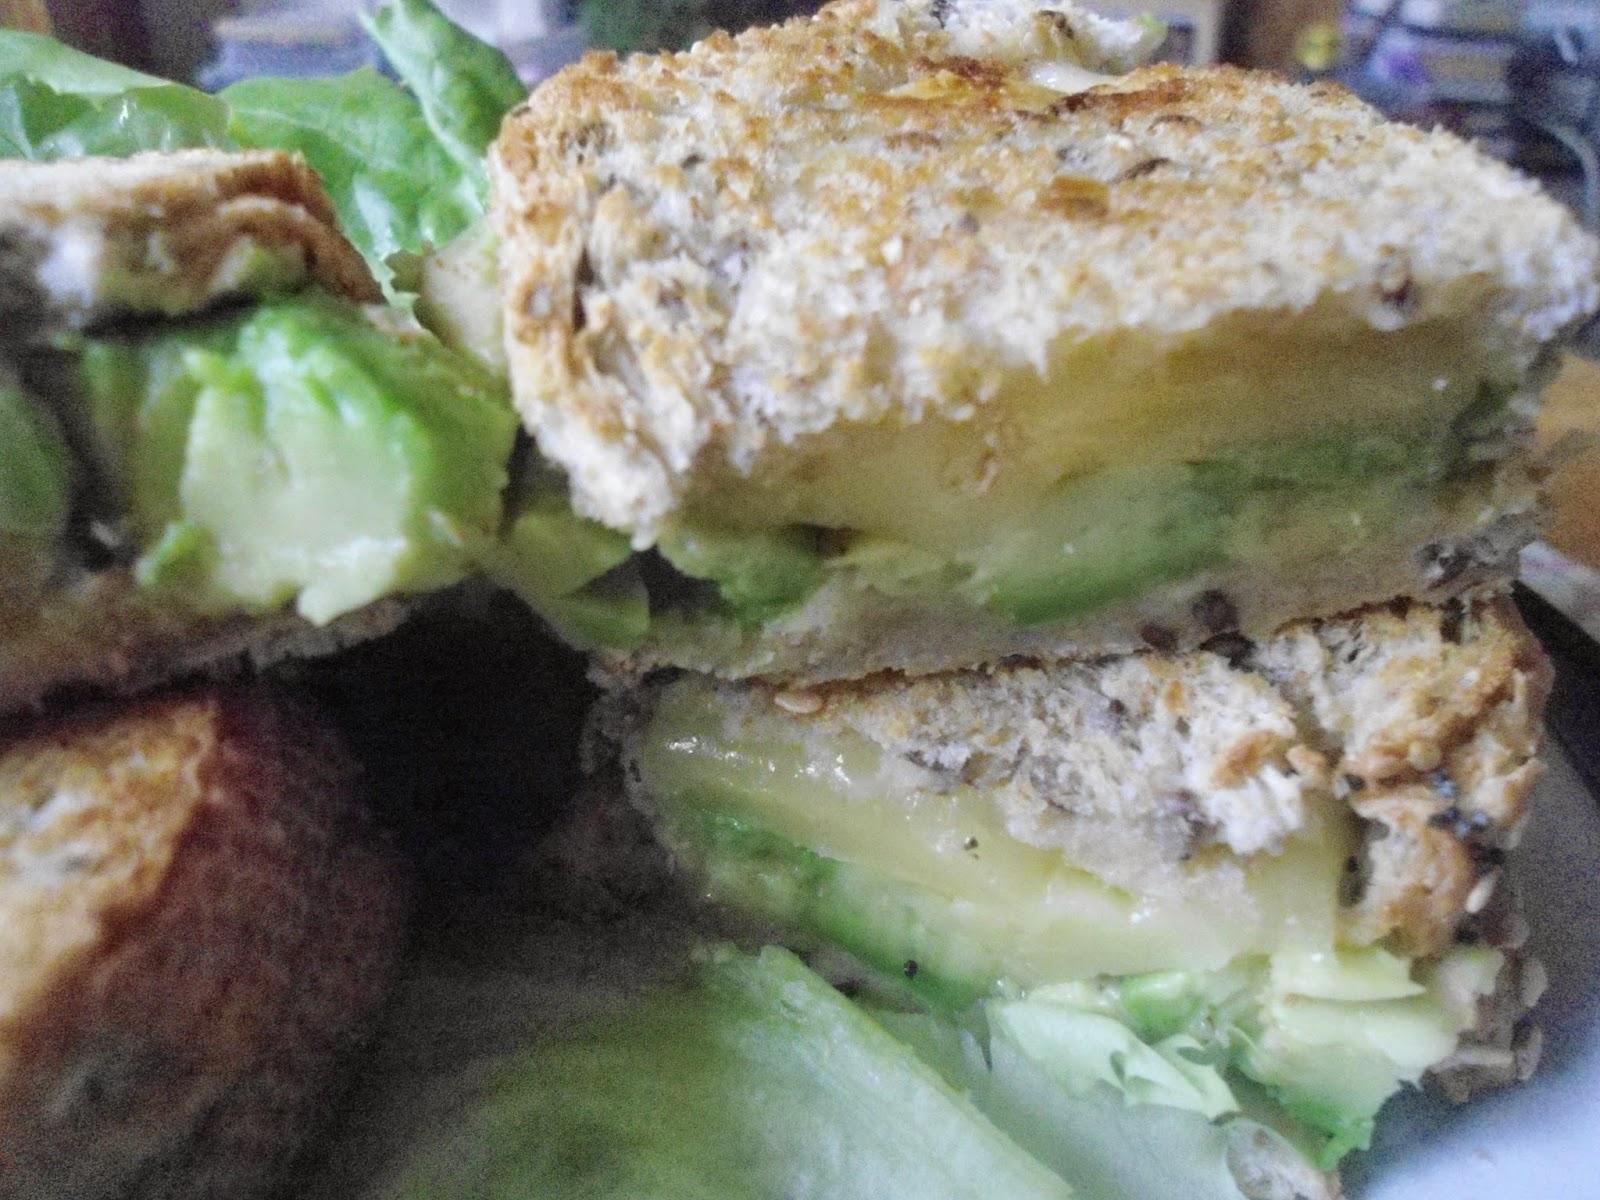 Kaltbach and avocado toasted sandwich